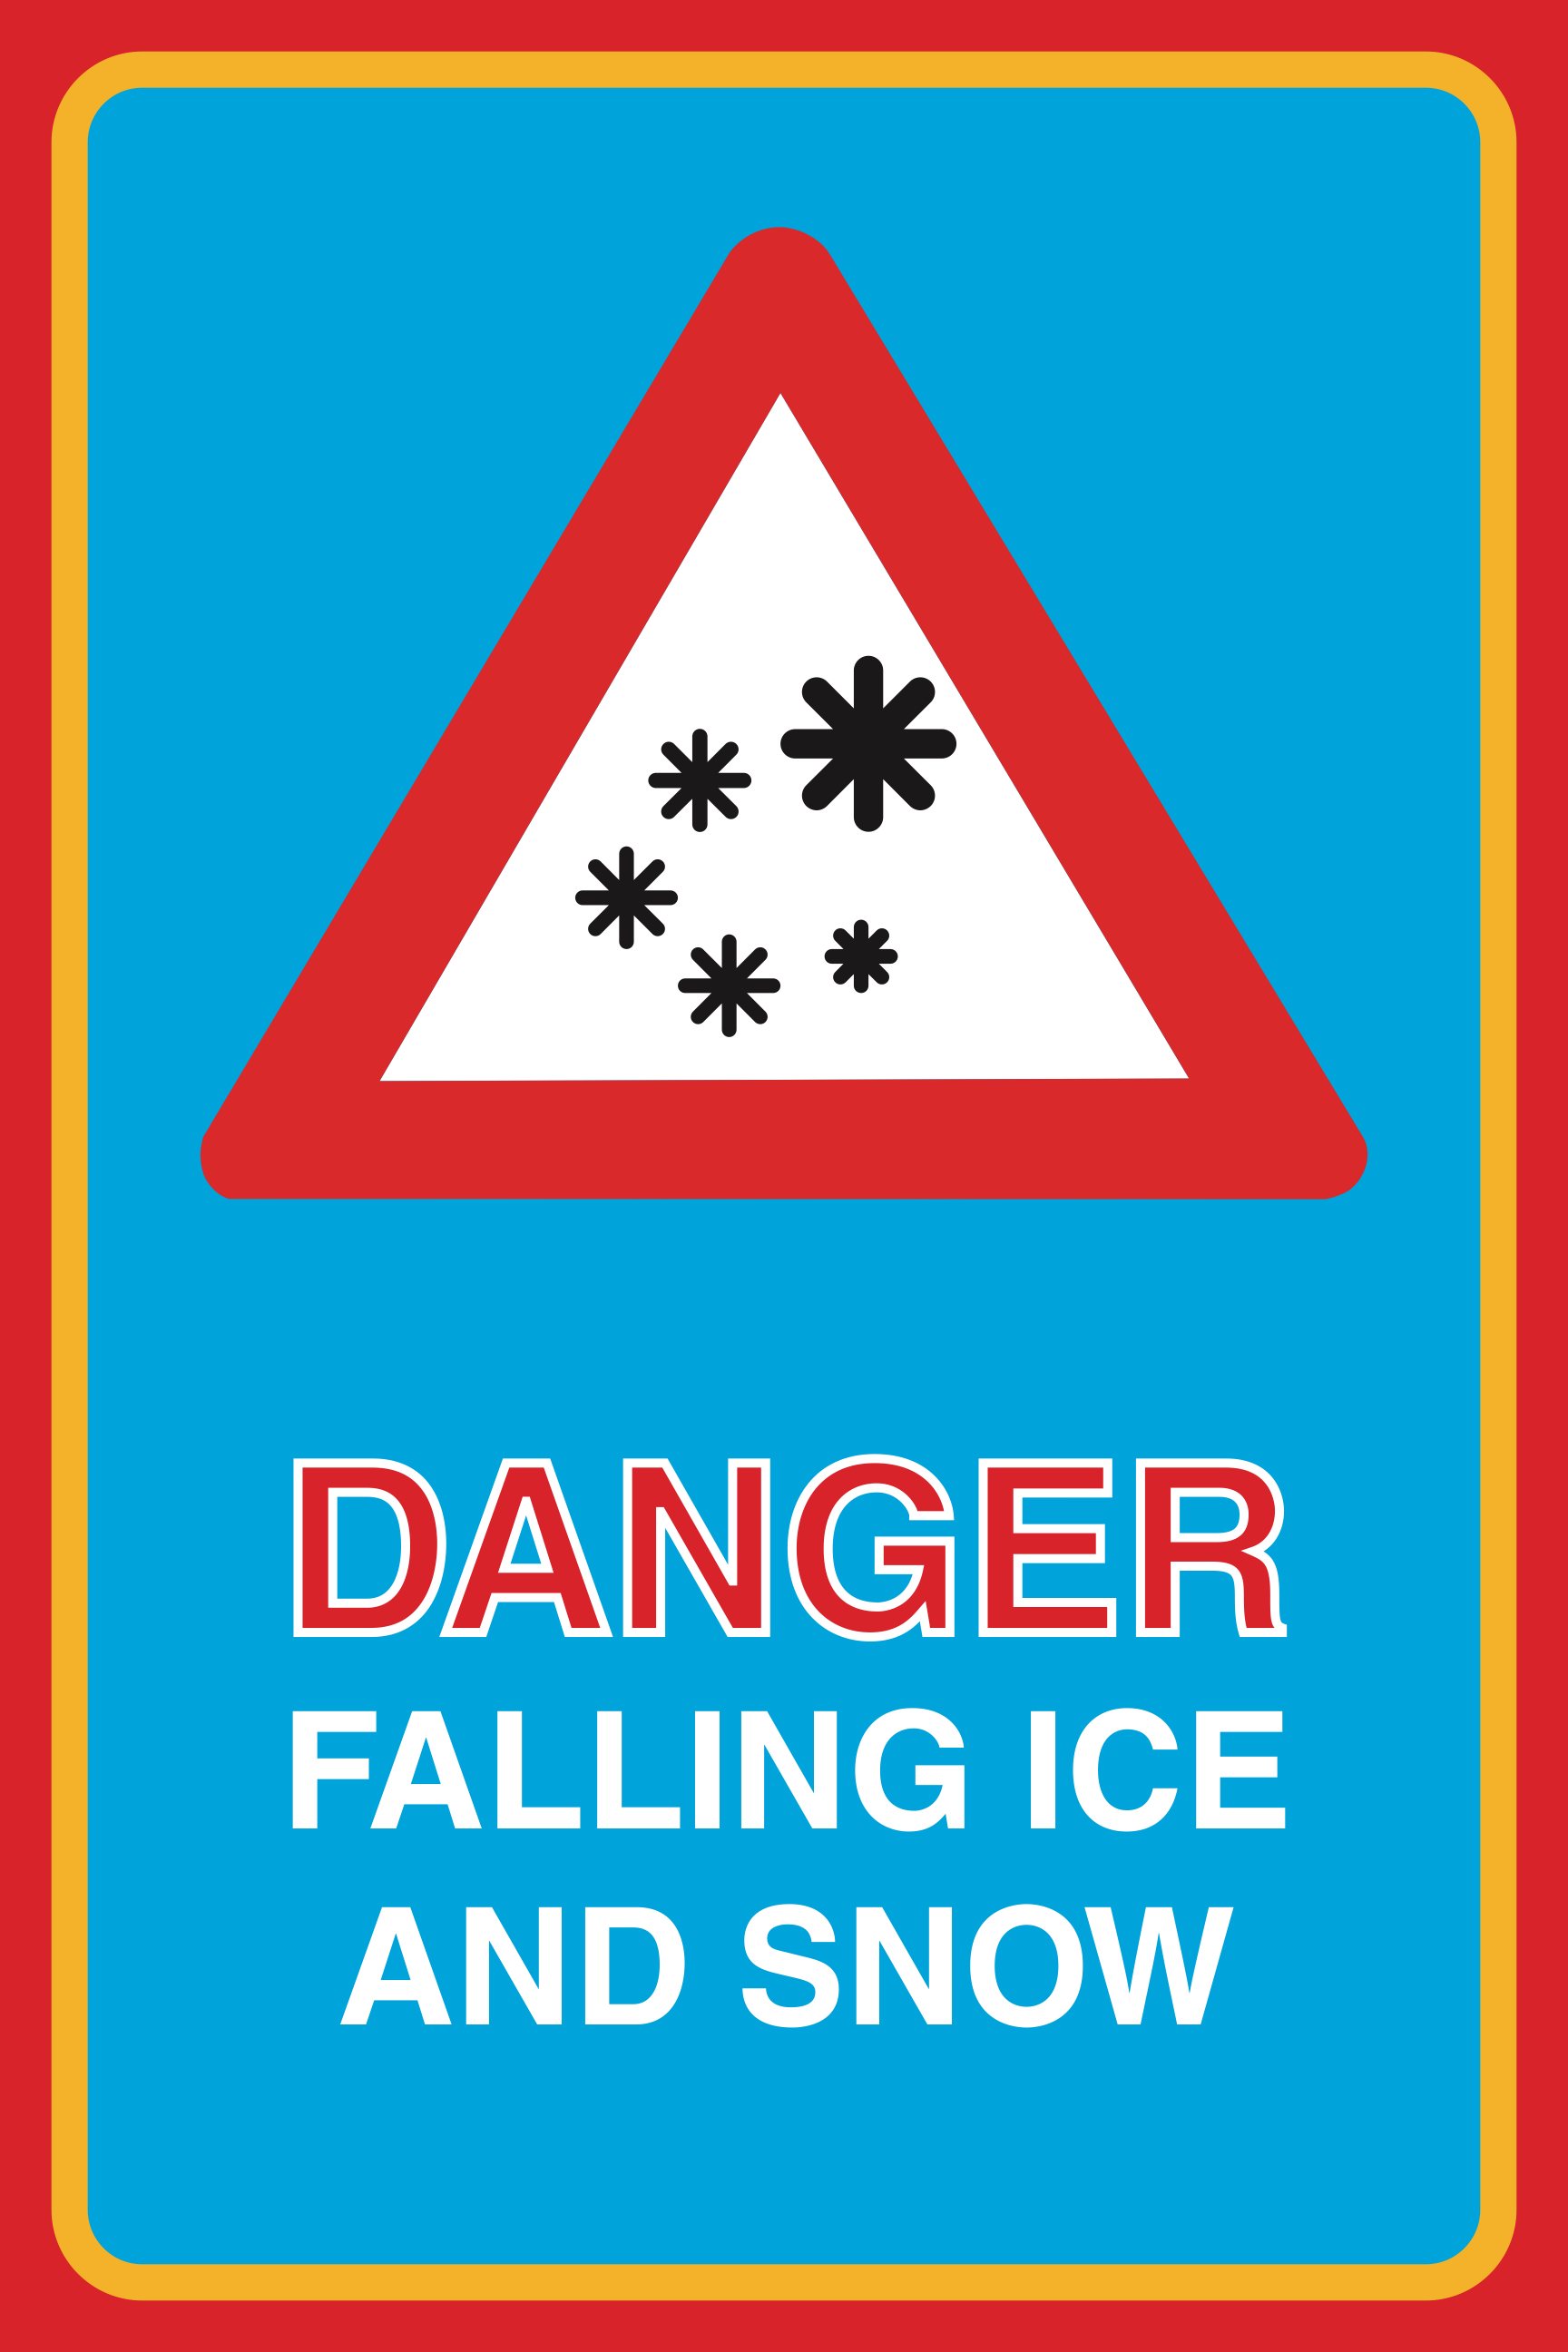 12x18 Please Walk No Running Print Man Picture Caution Street Road Business Large Public Notice Sign Aluminum Metal